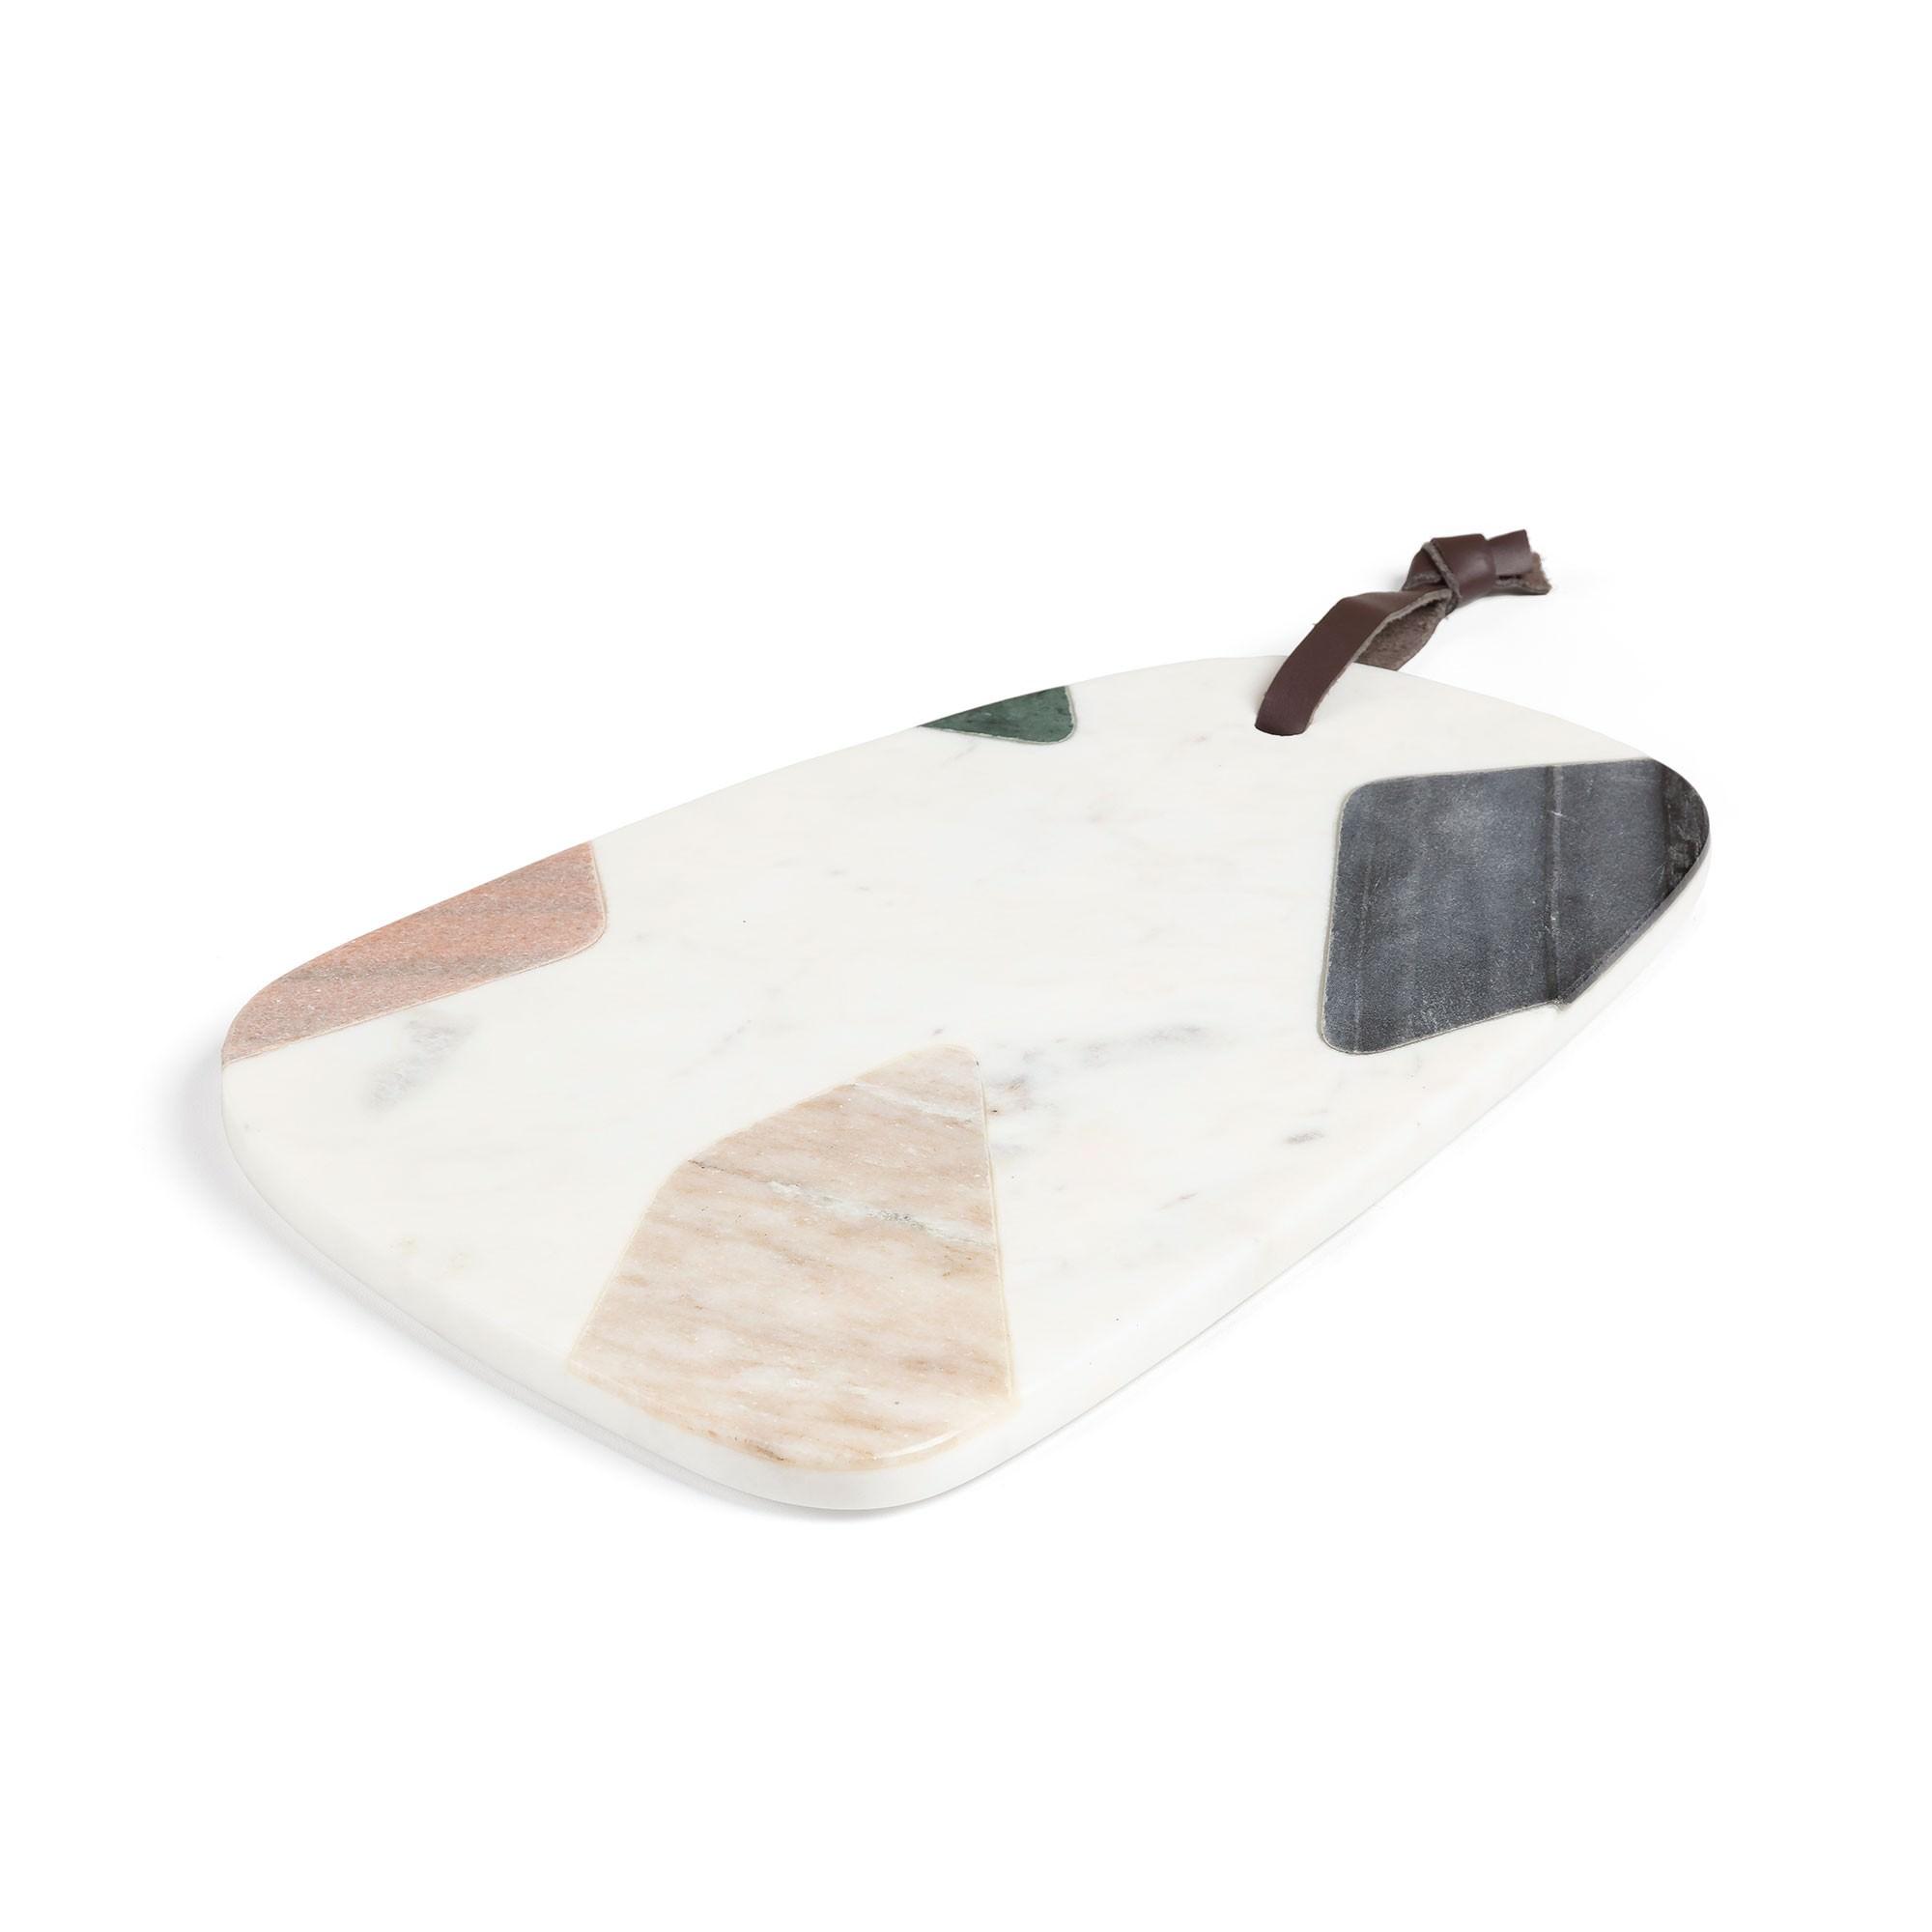 Ainsworth Marble Quadrilateral Serving Board, 30x20cm, Multi